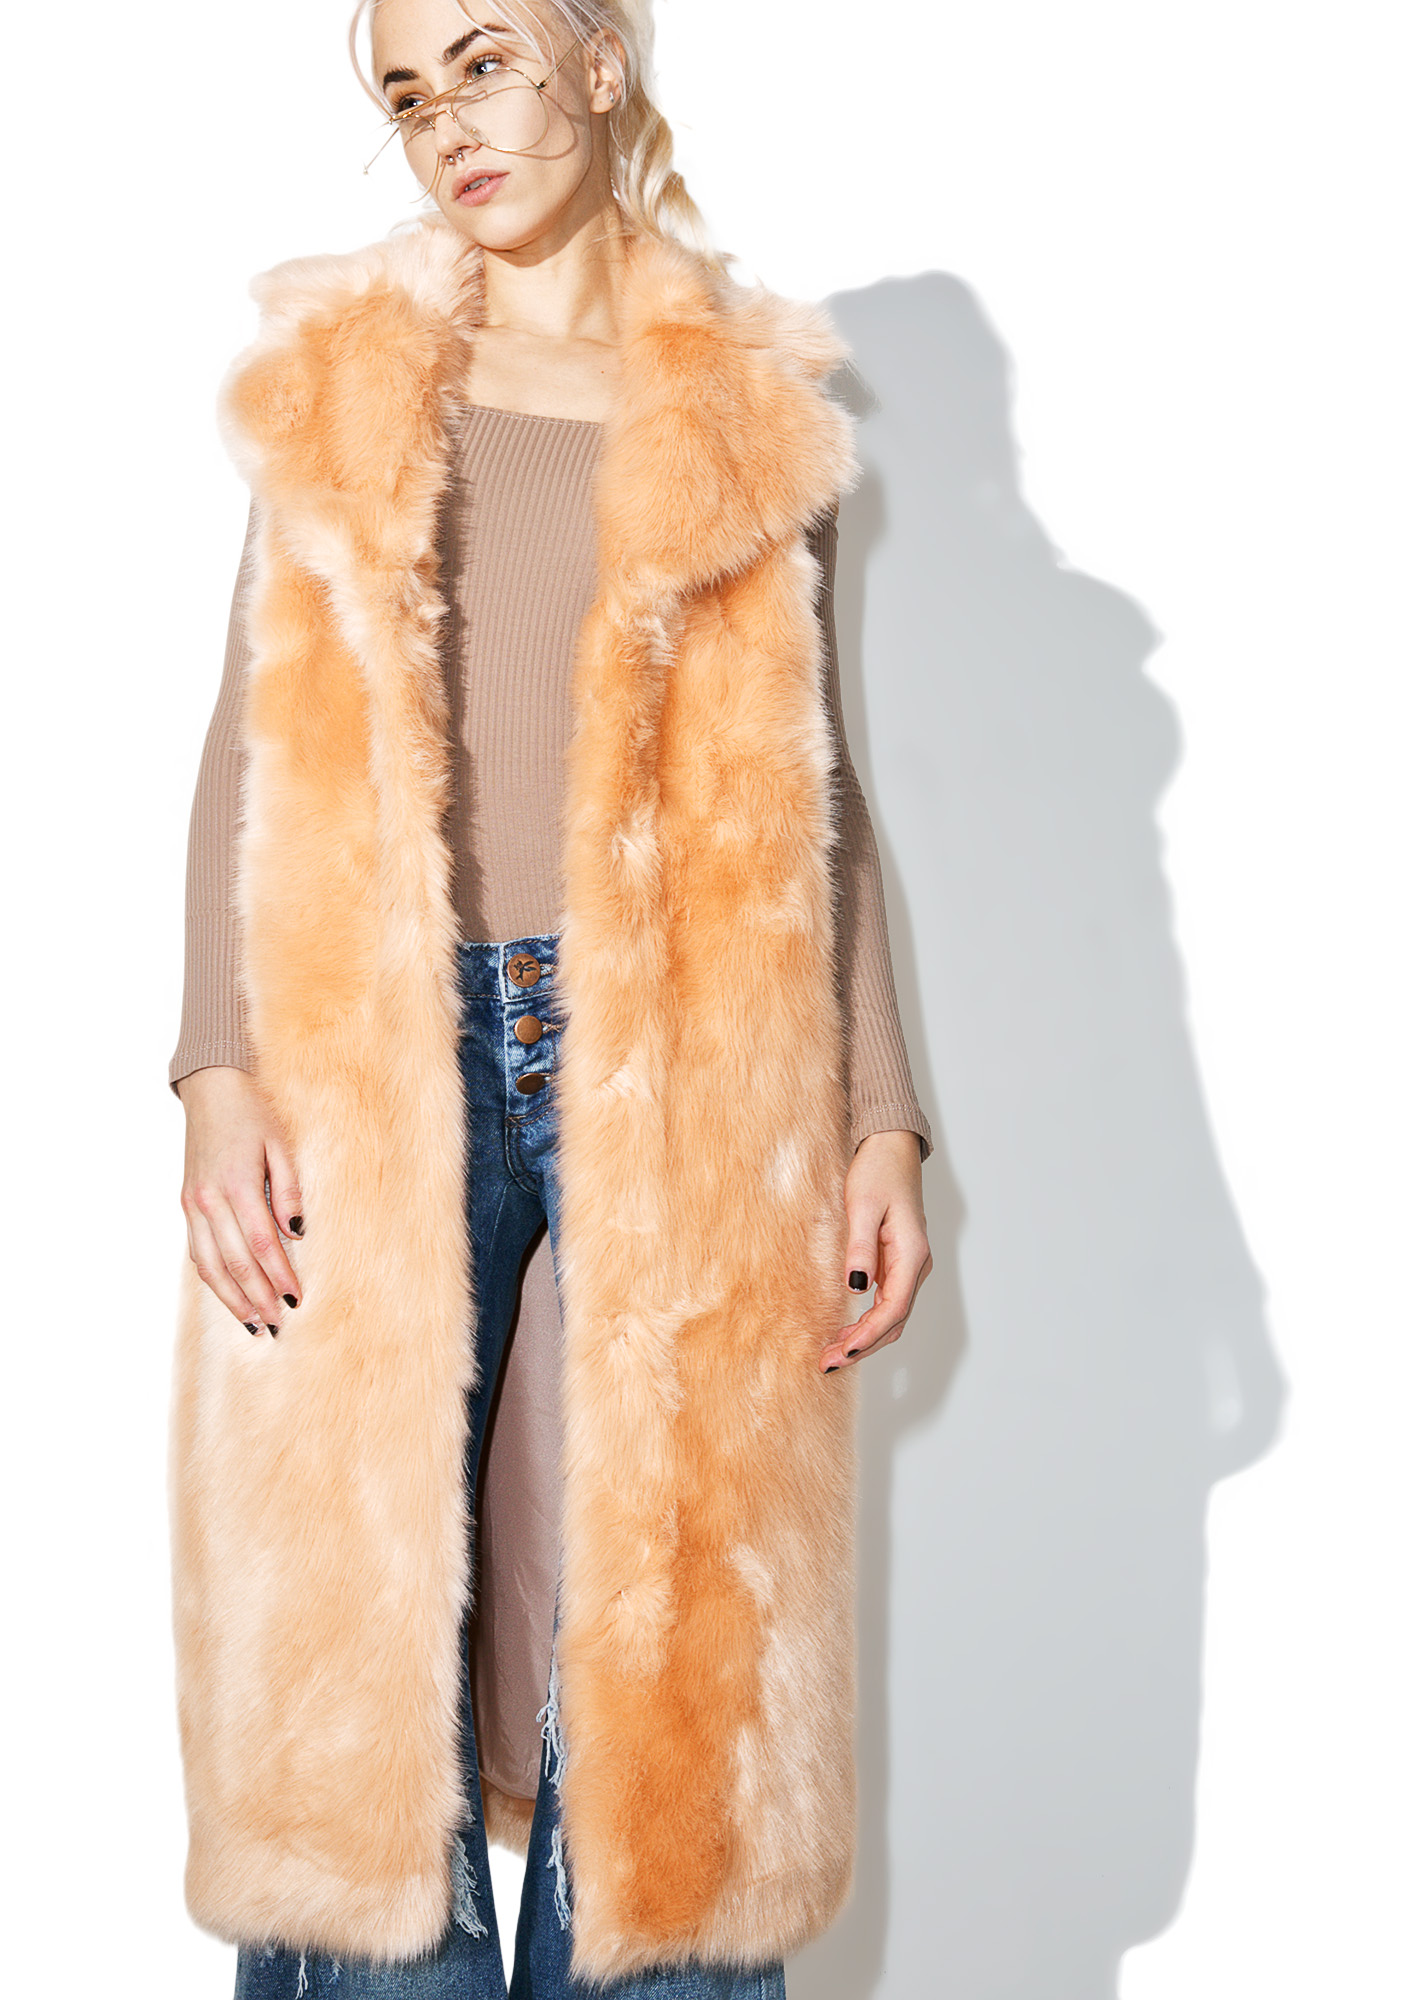 Jakke Martha Sleeveless Duster Coat